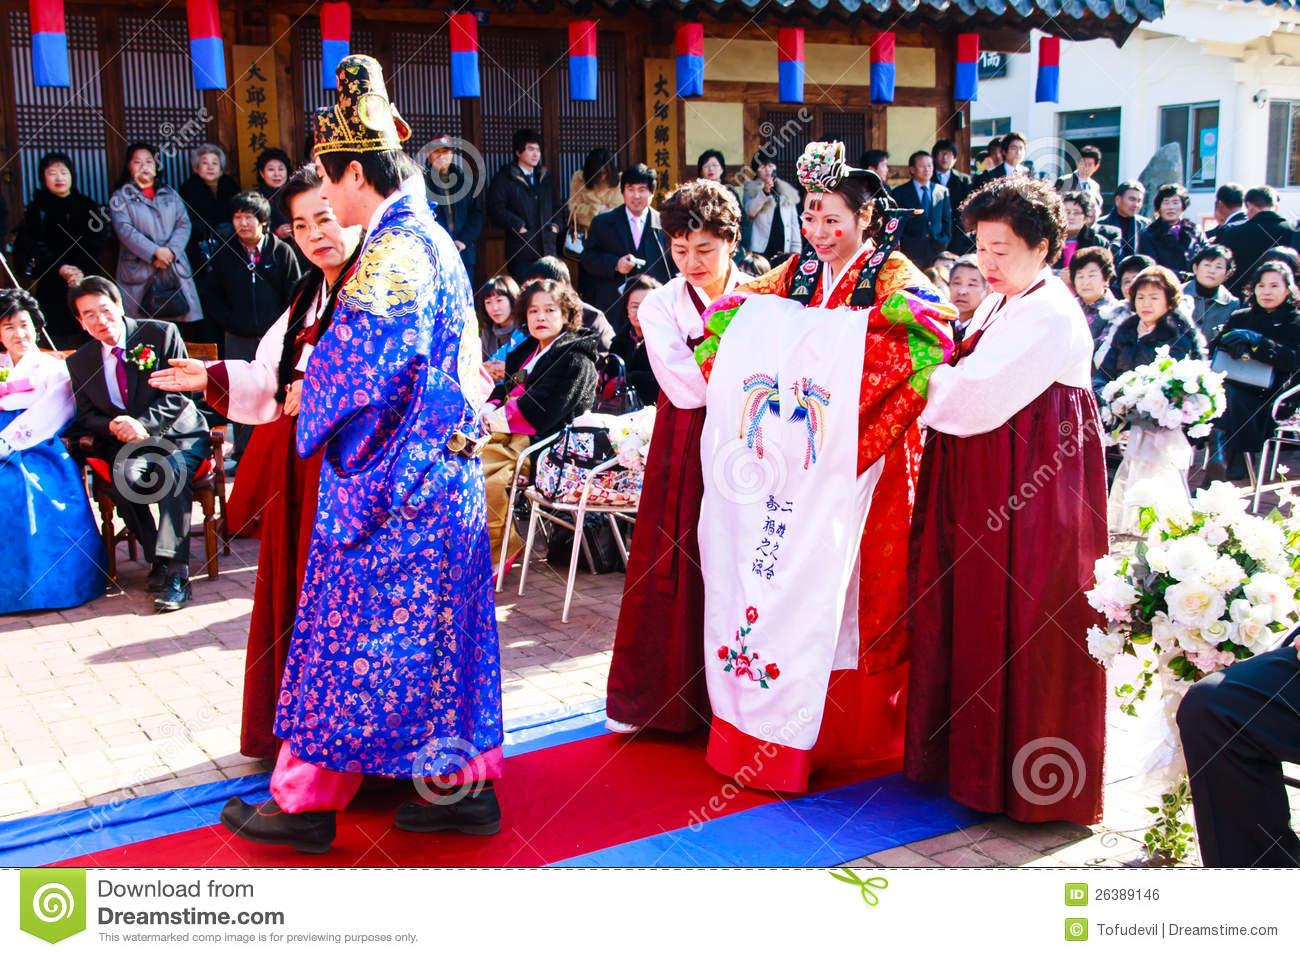 korean traditional wedding dresses photo - 1